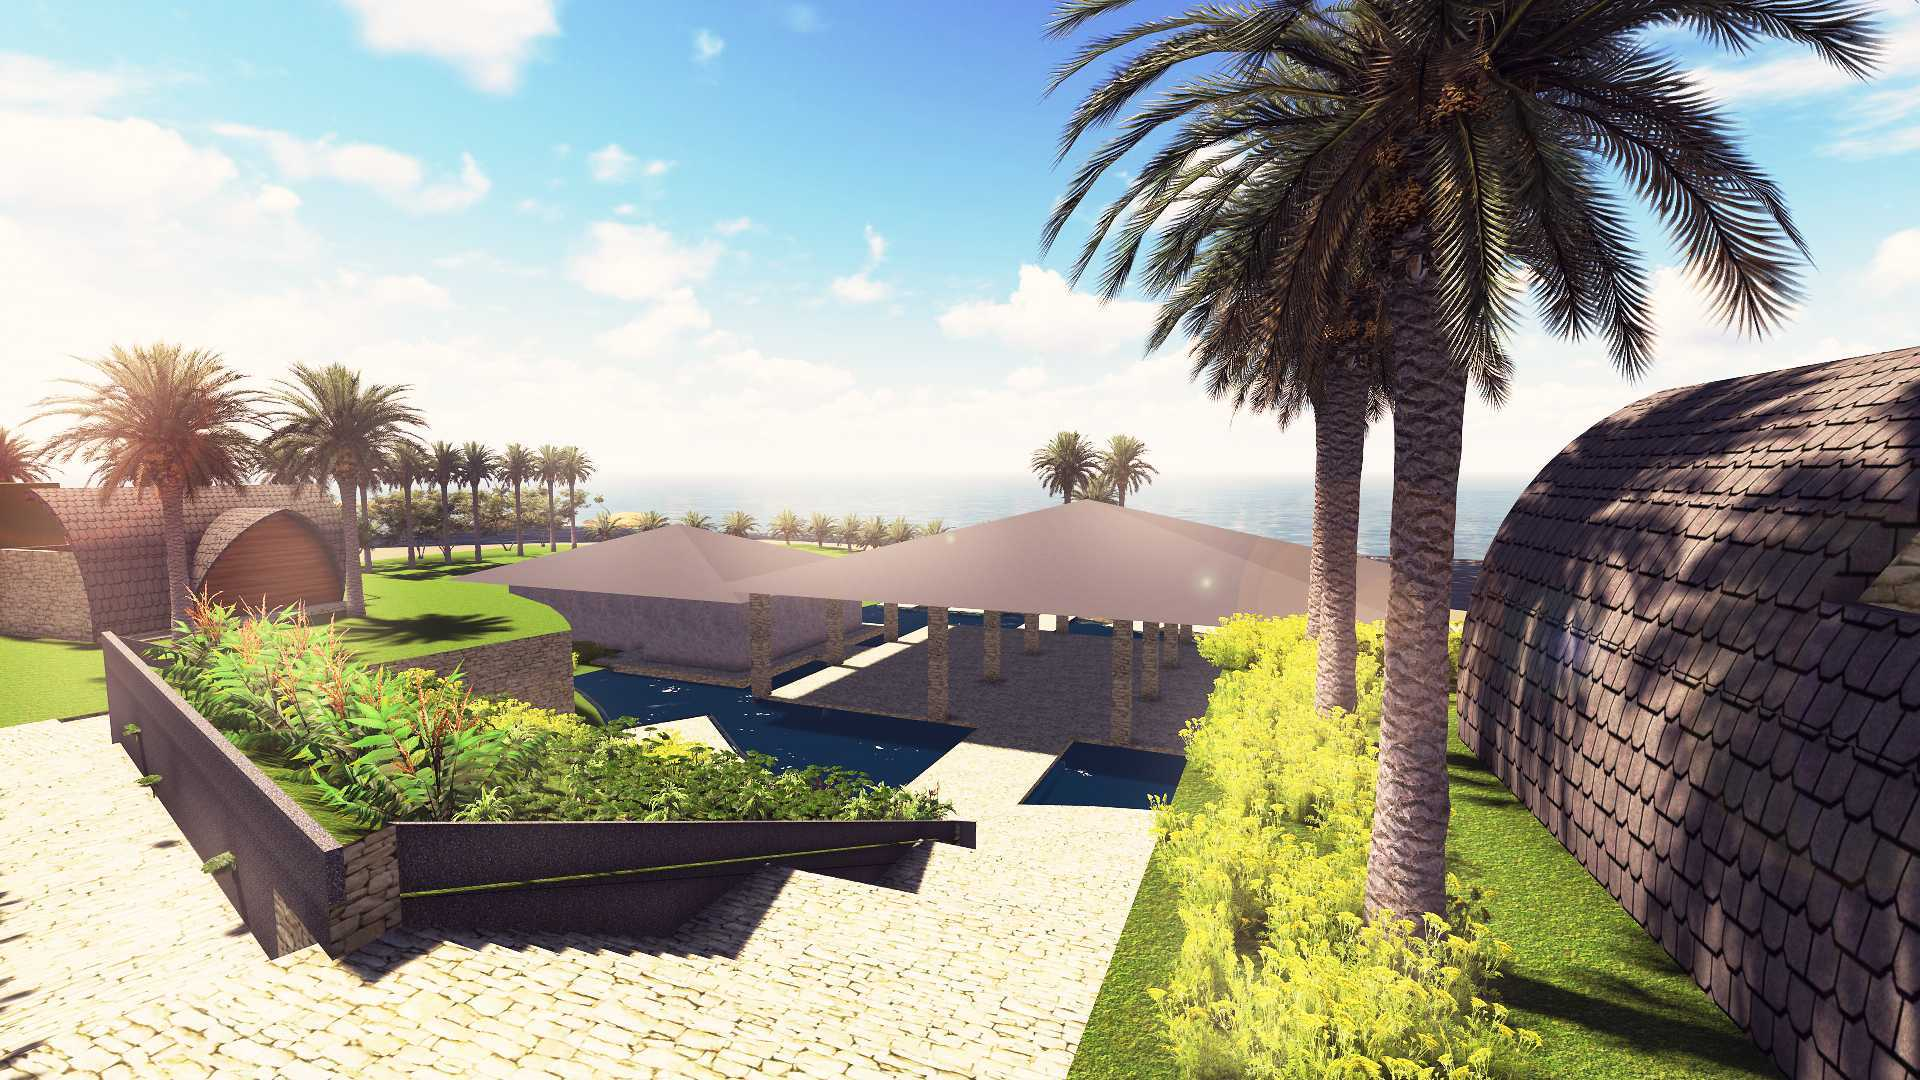 Equator.architect Resort And Diving Centre Tanjung Bulutan, Lombok Tanjung Bulutan, Lombok Staircase   15948